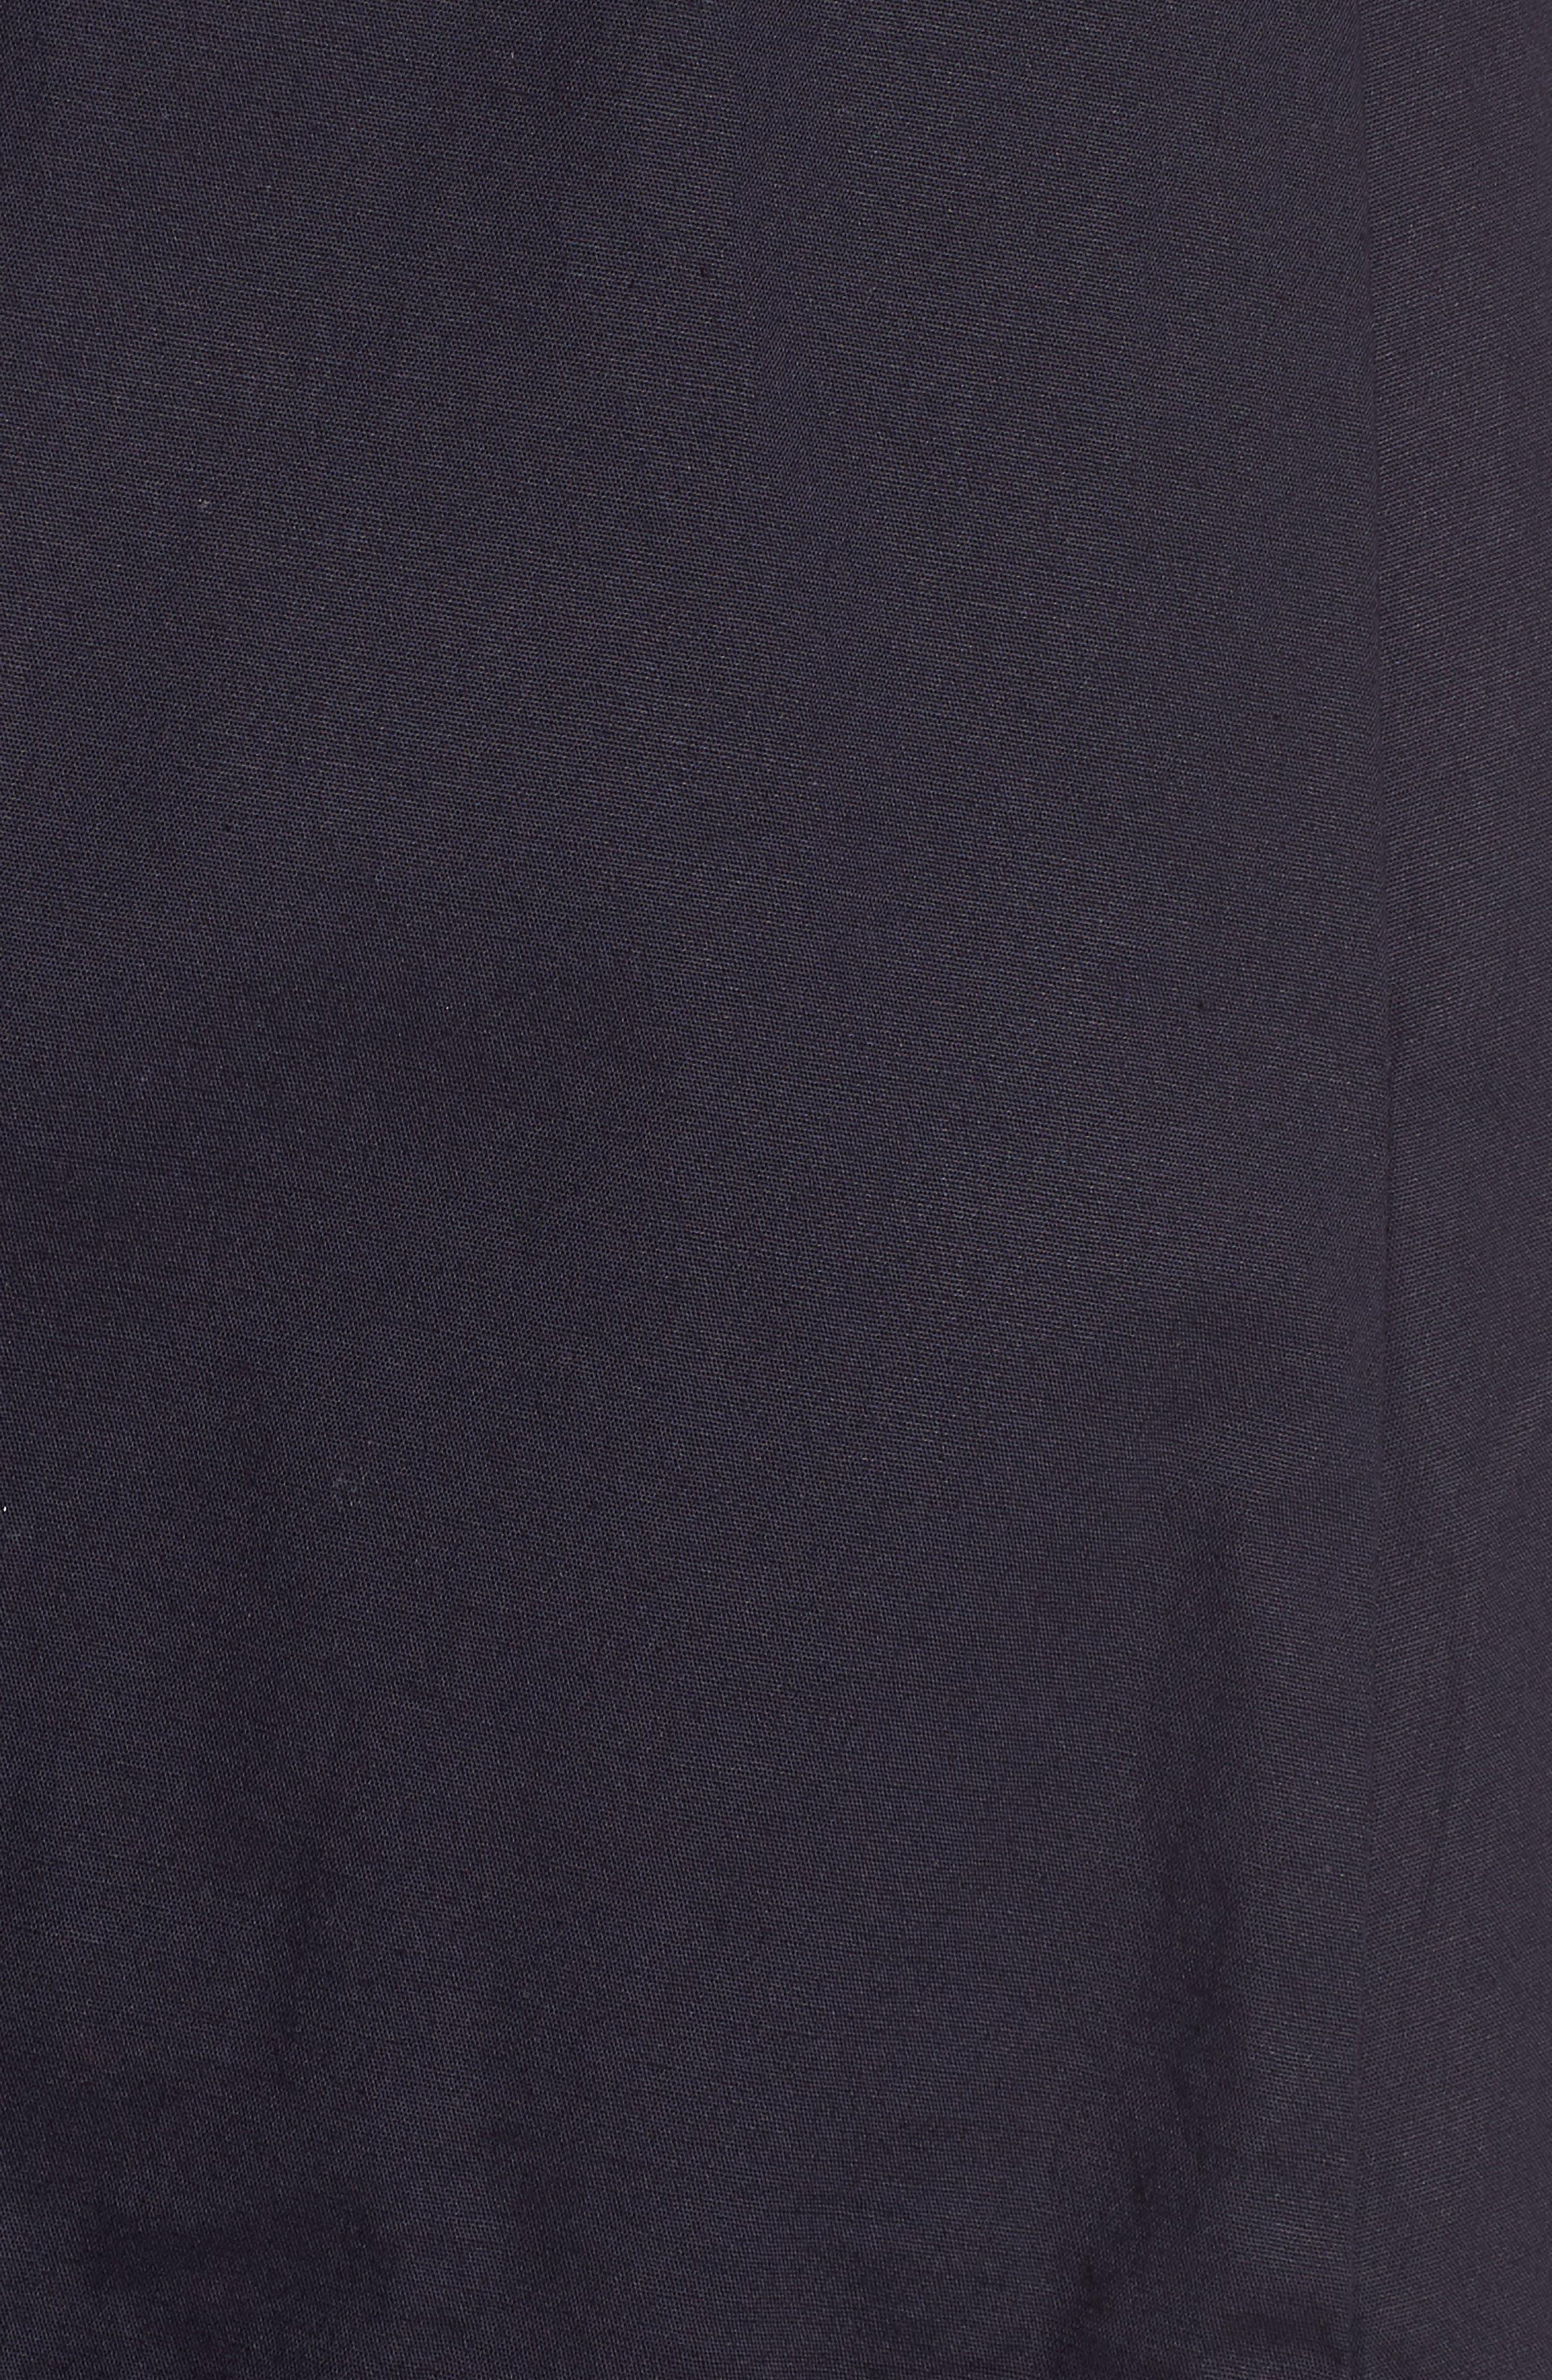 Pleat Collar Shirtdress,                             Alternate thumbnail 14, color,